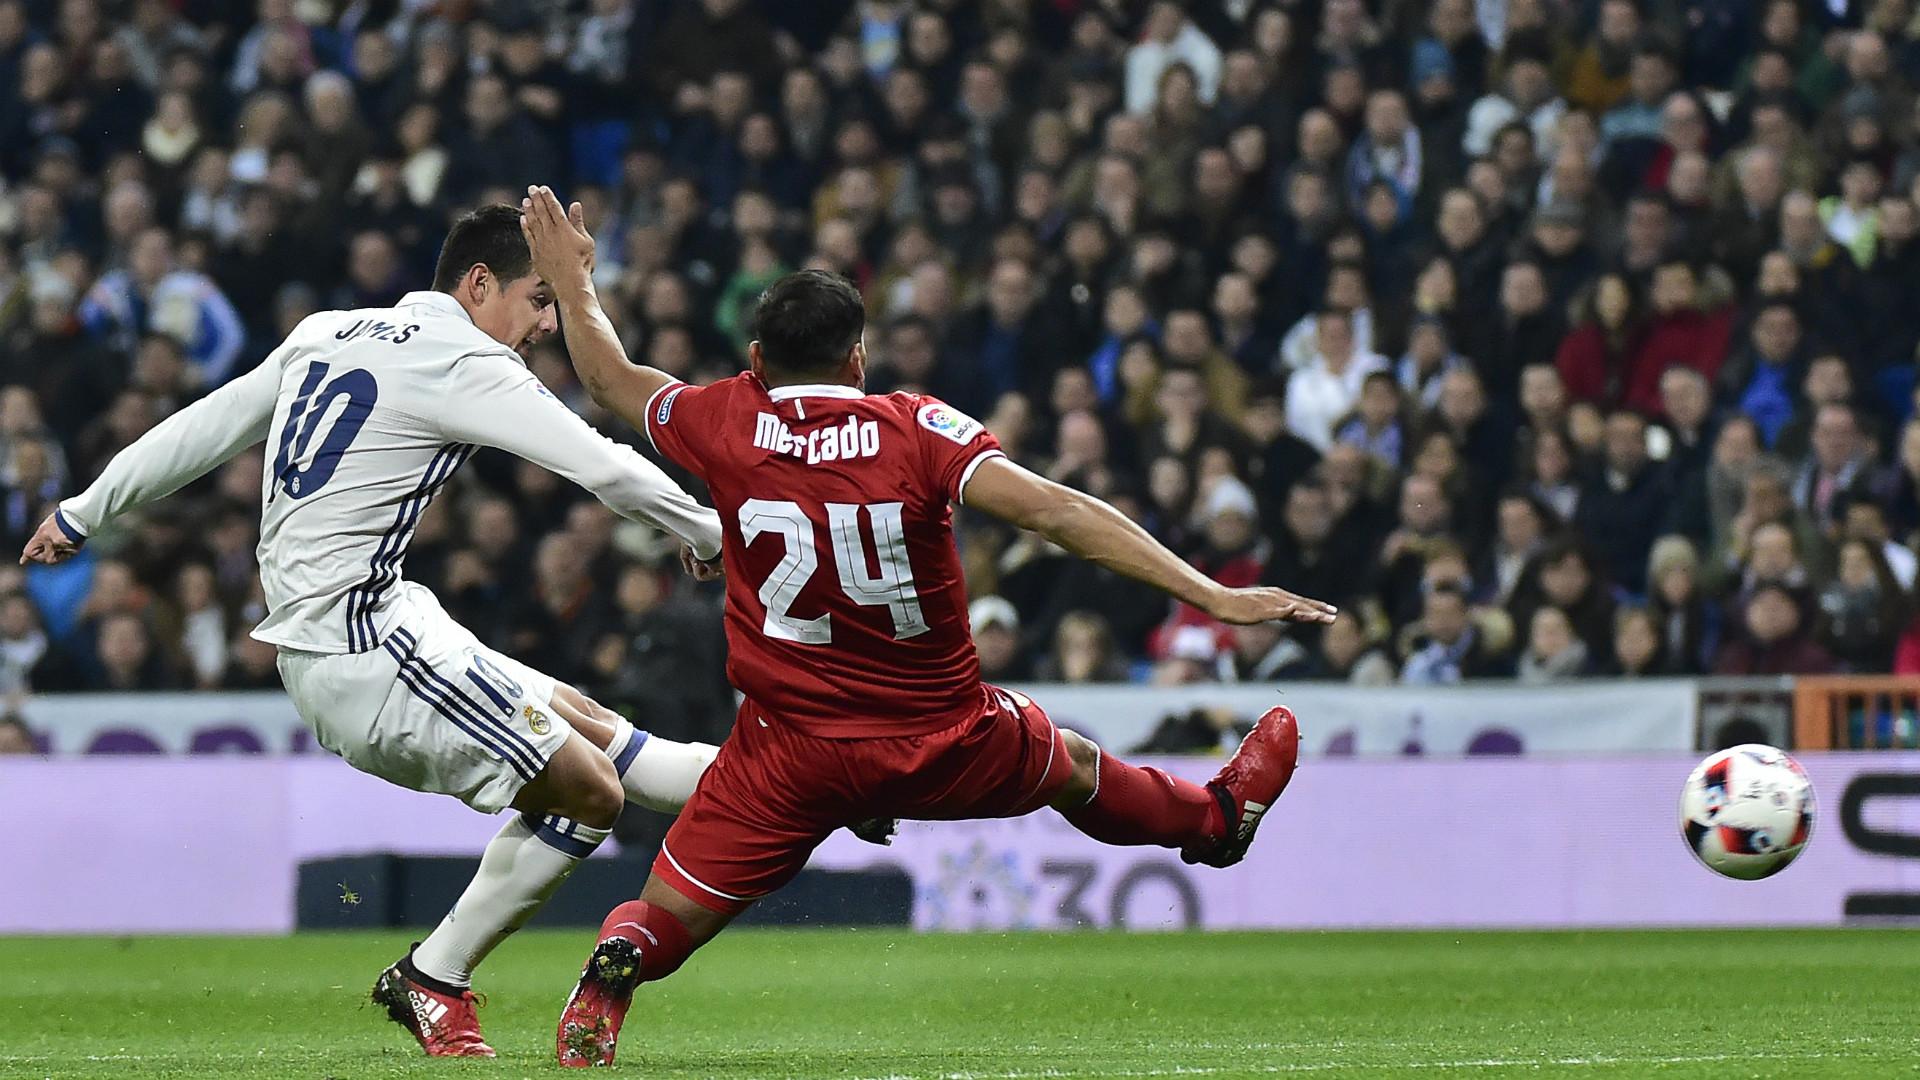 James Rodriguez Gabriel Mercado Real Madrid Sevilla Copa del Rey